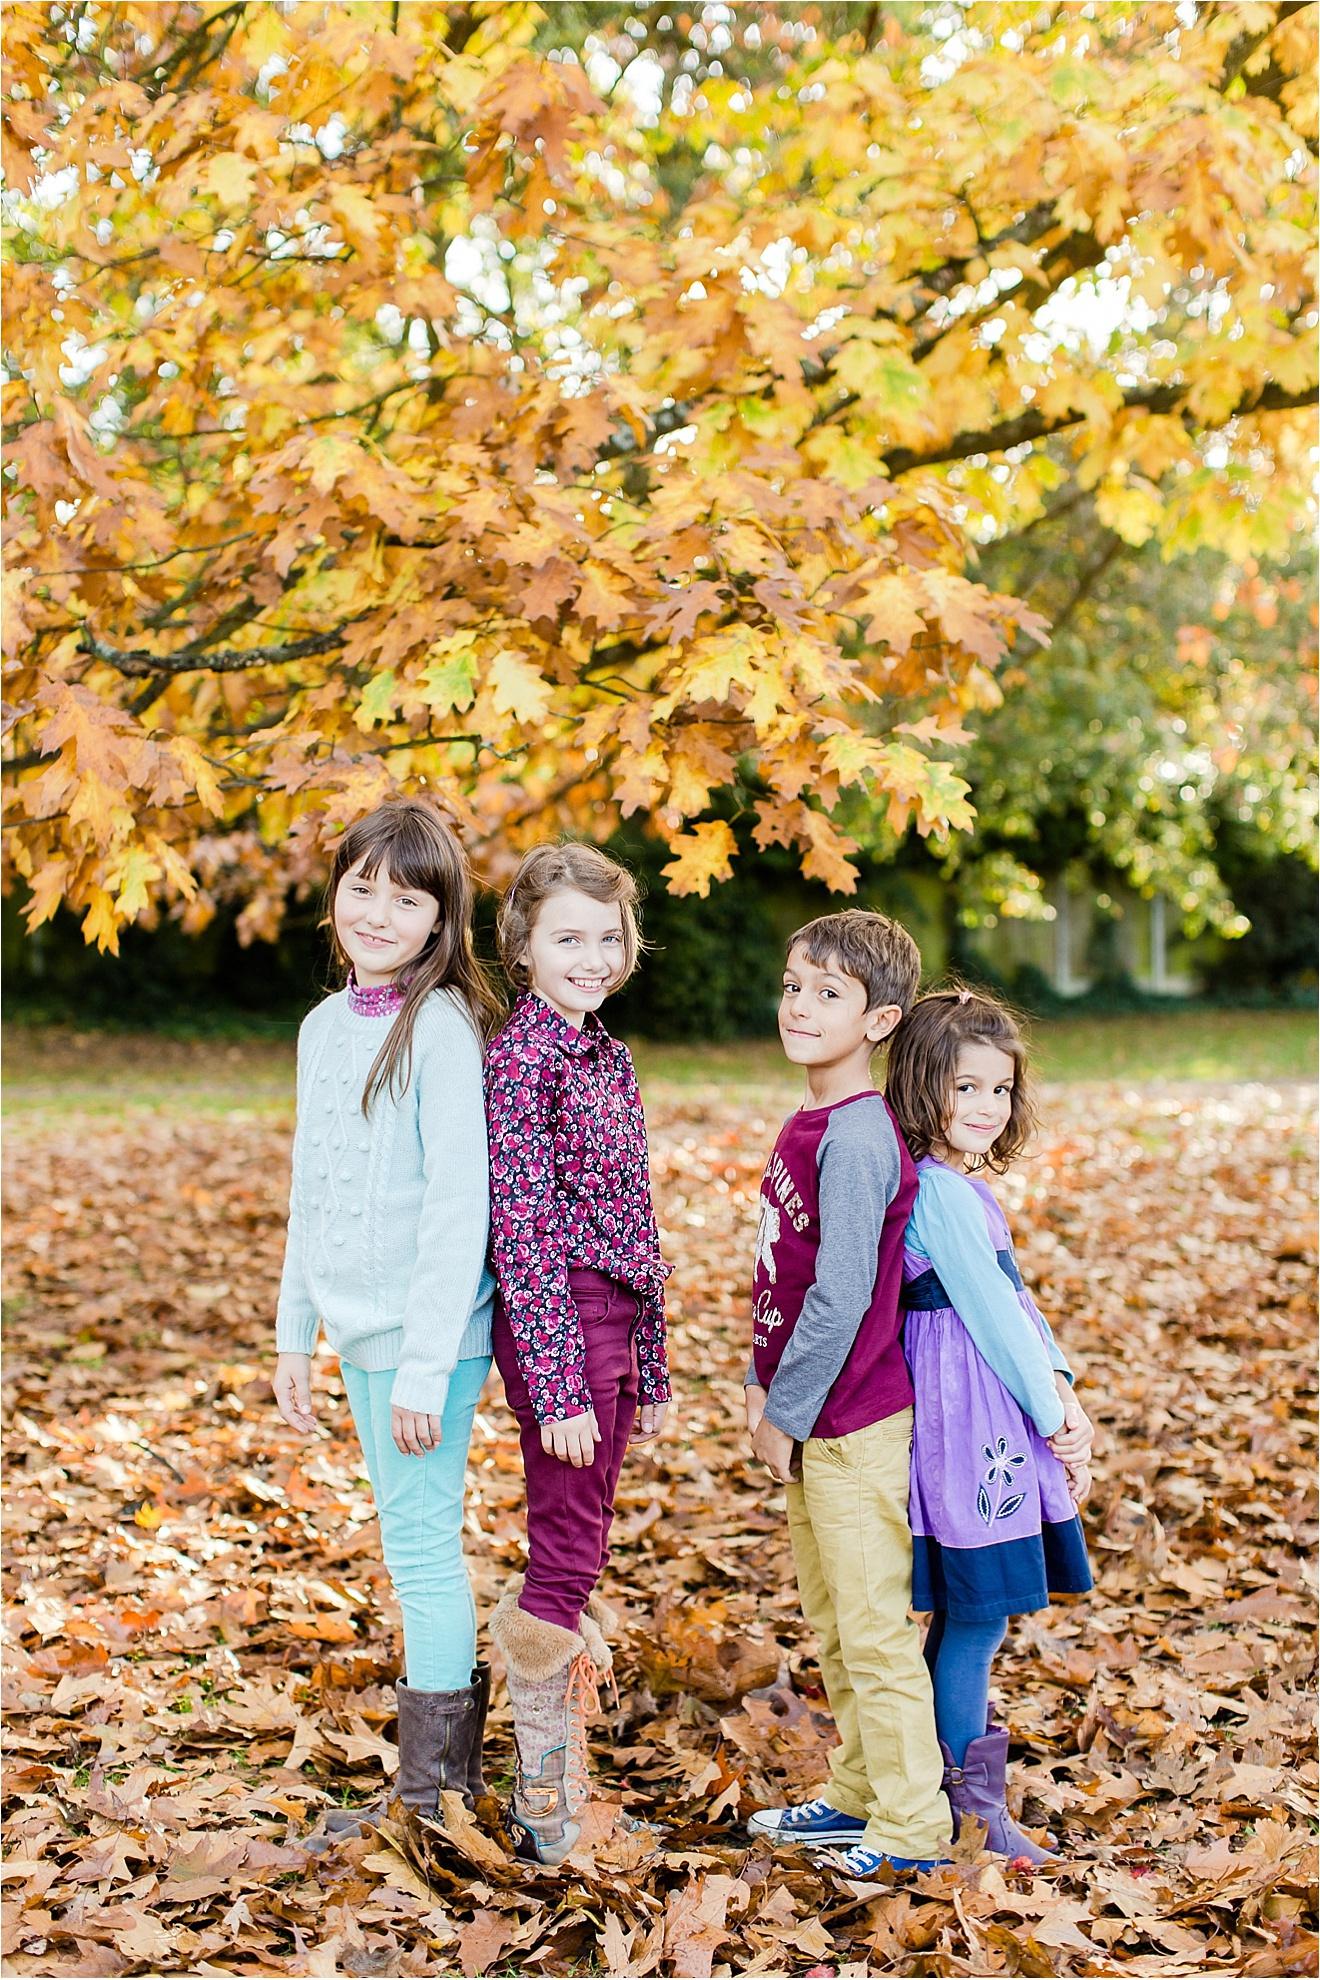 003_family-photography-surrey-autumn-mini-session-eddie-judd-photographer_9561